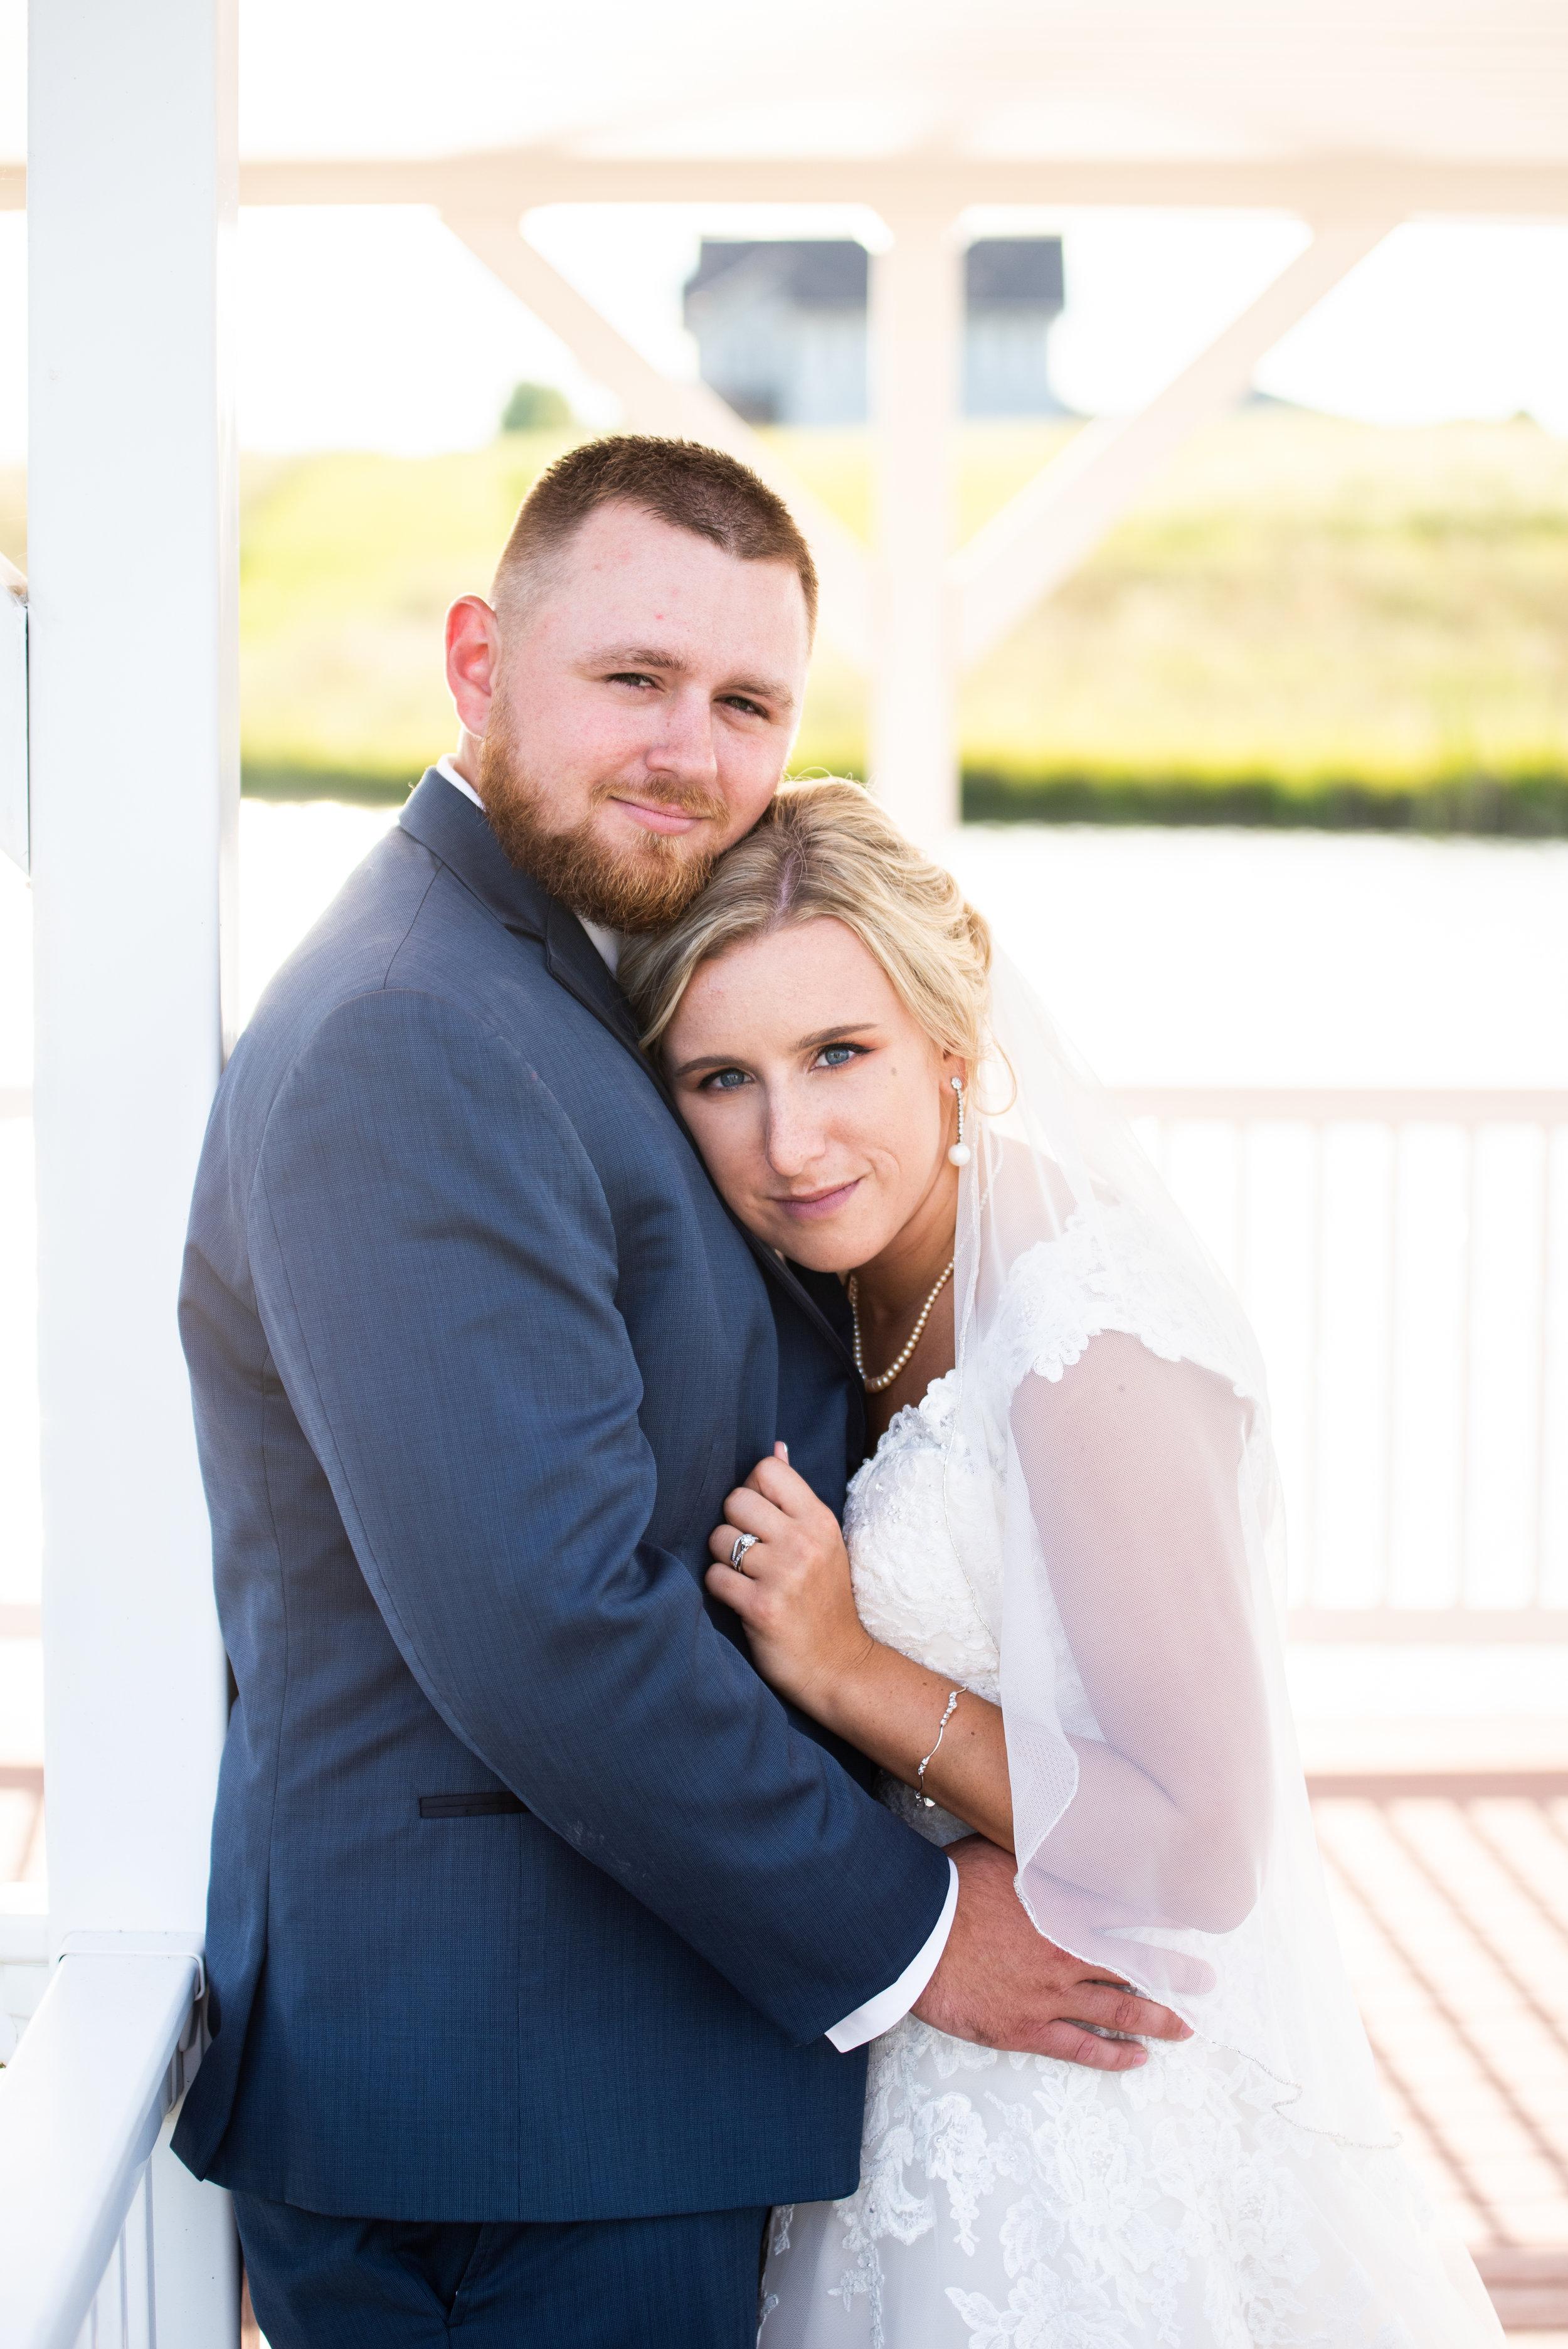 wedding (1 of 1)-196.jpg